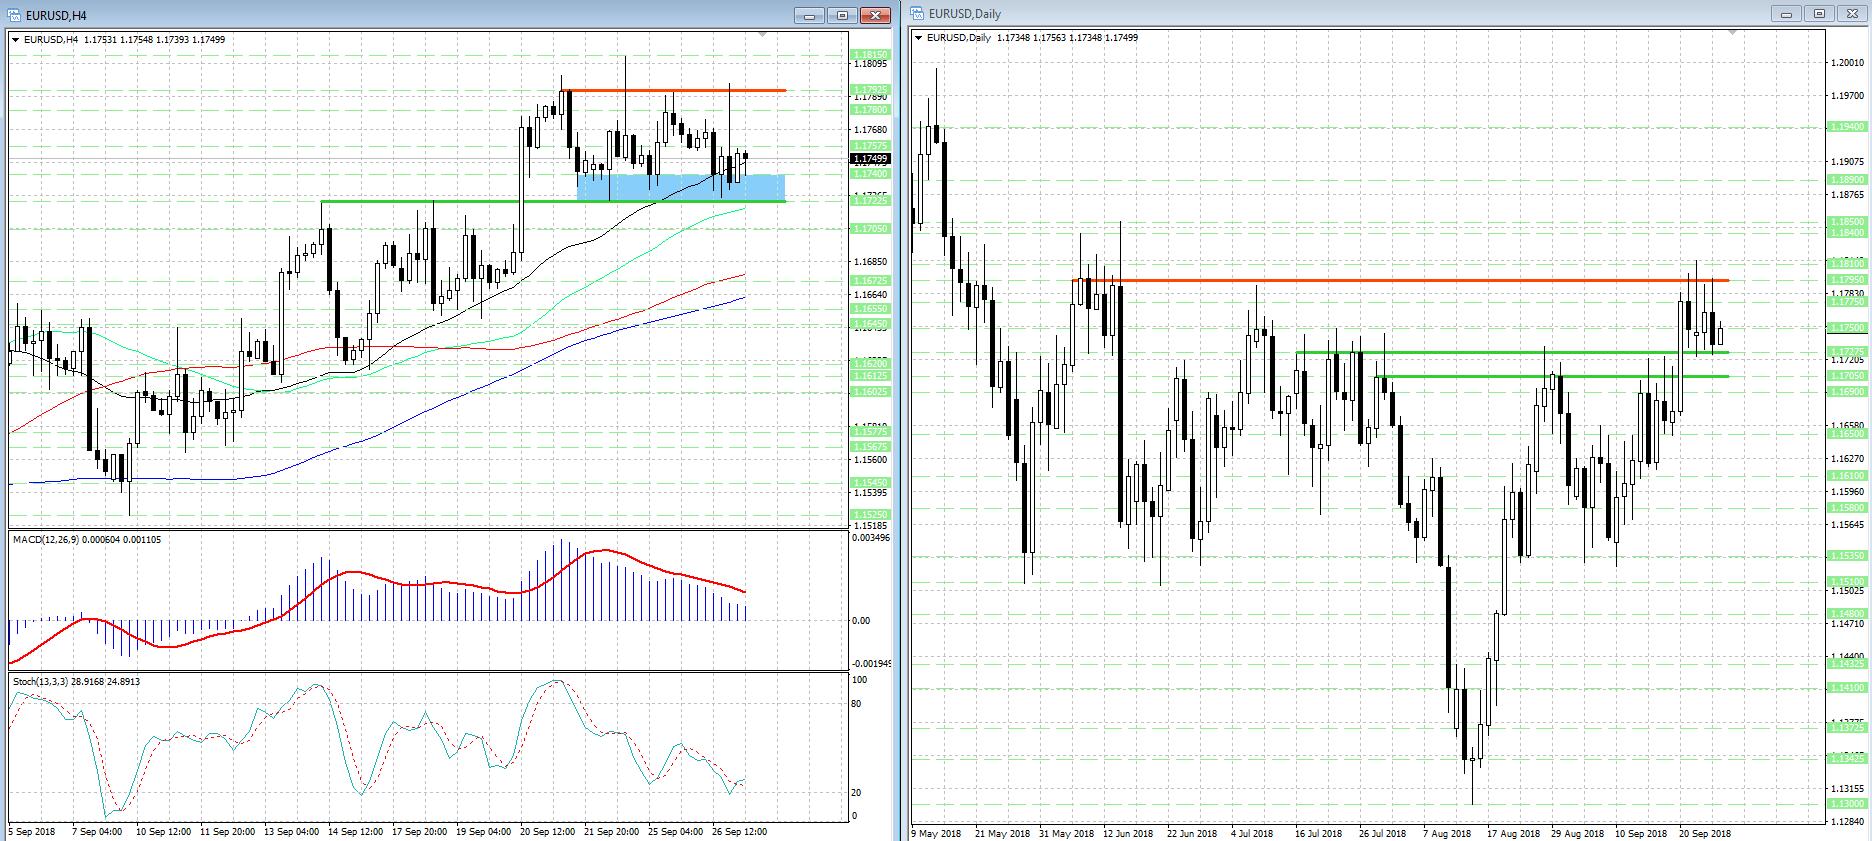 Краткосрочные перспективы валютной пары EUR/USD по-прежнему туманны...